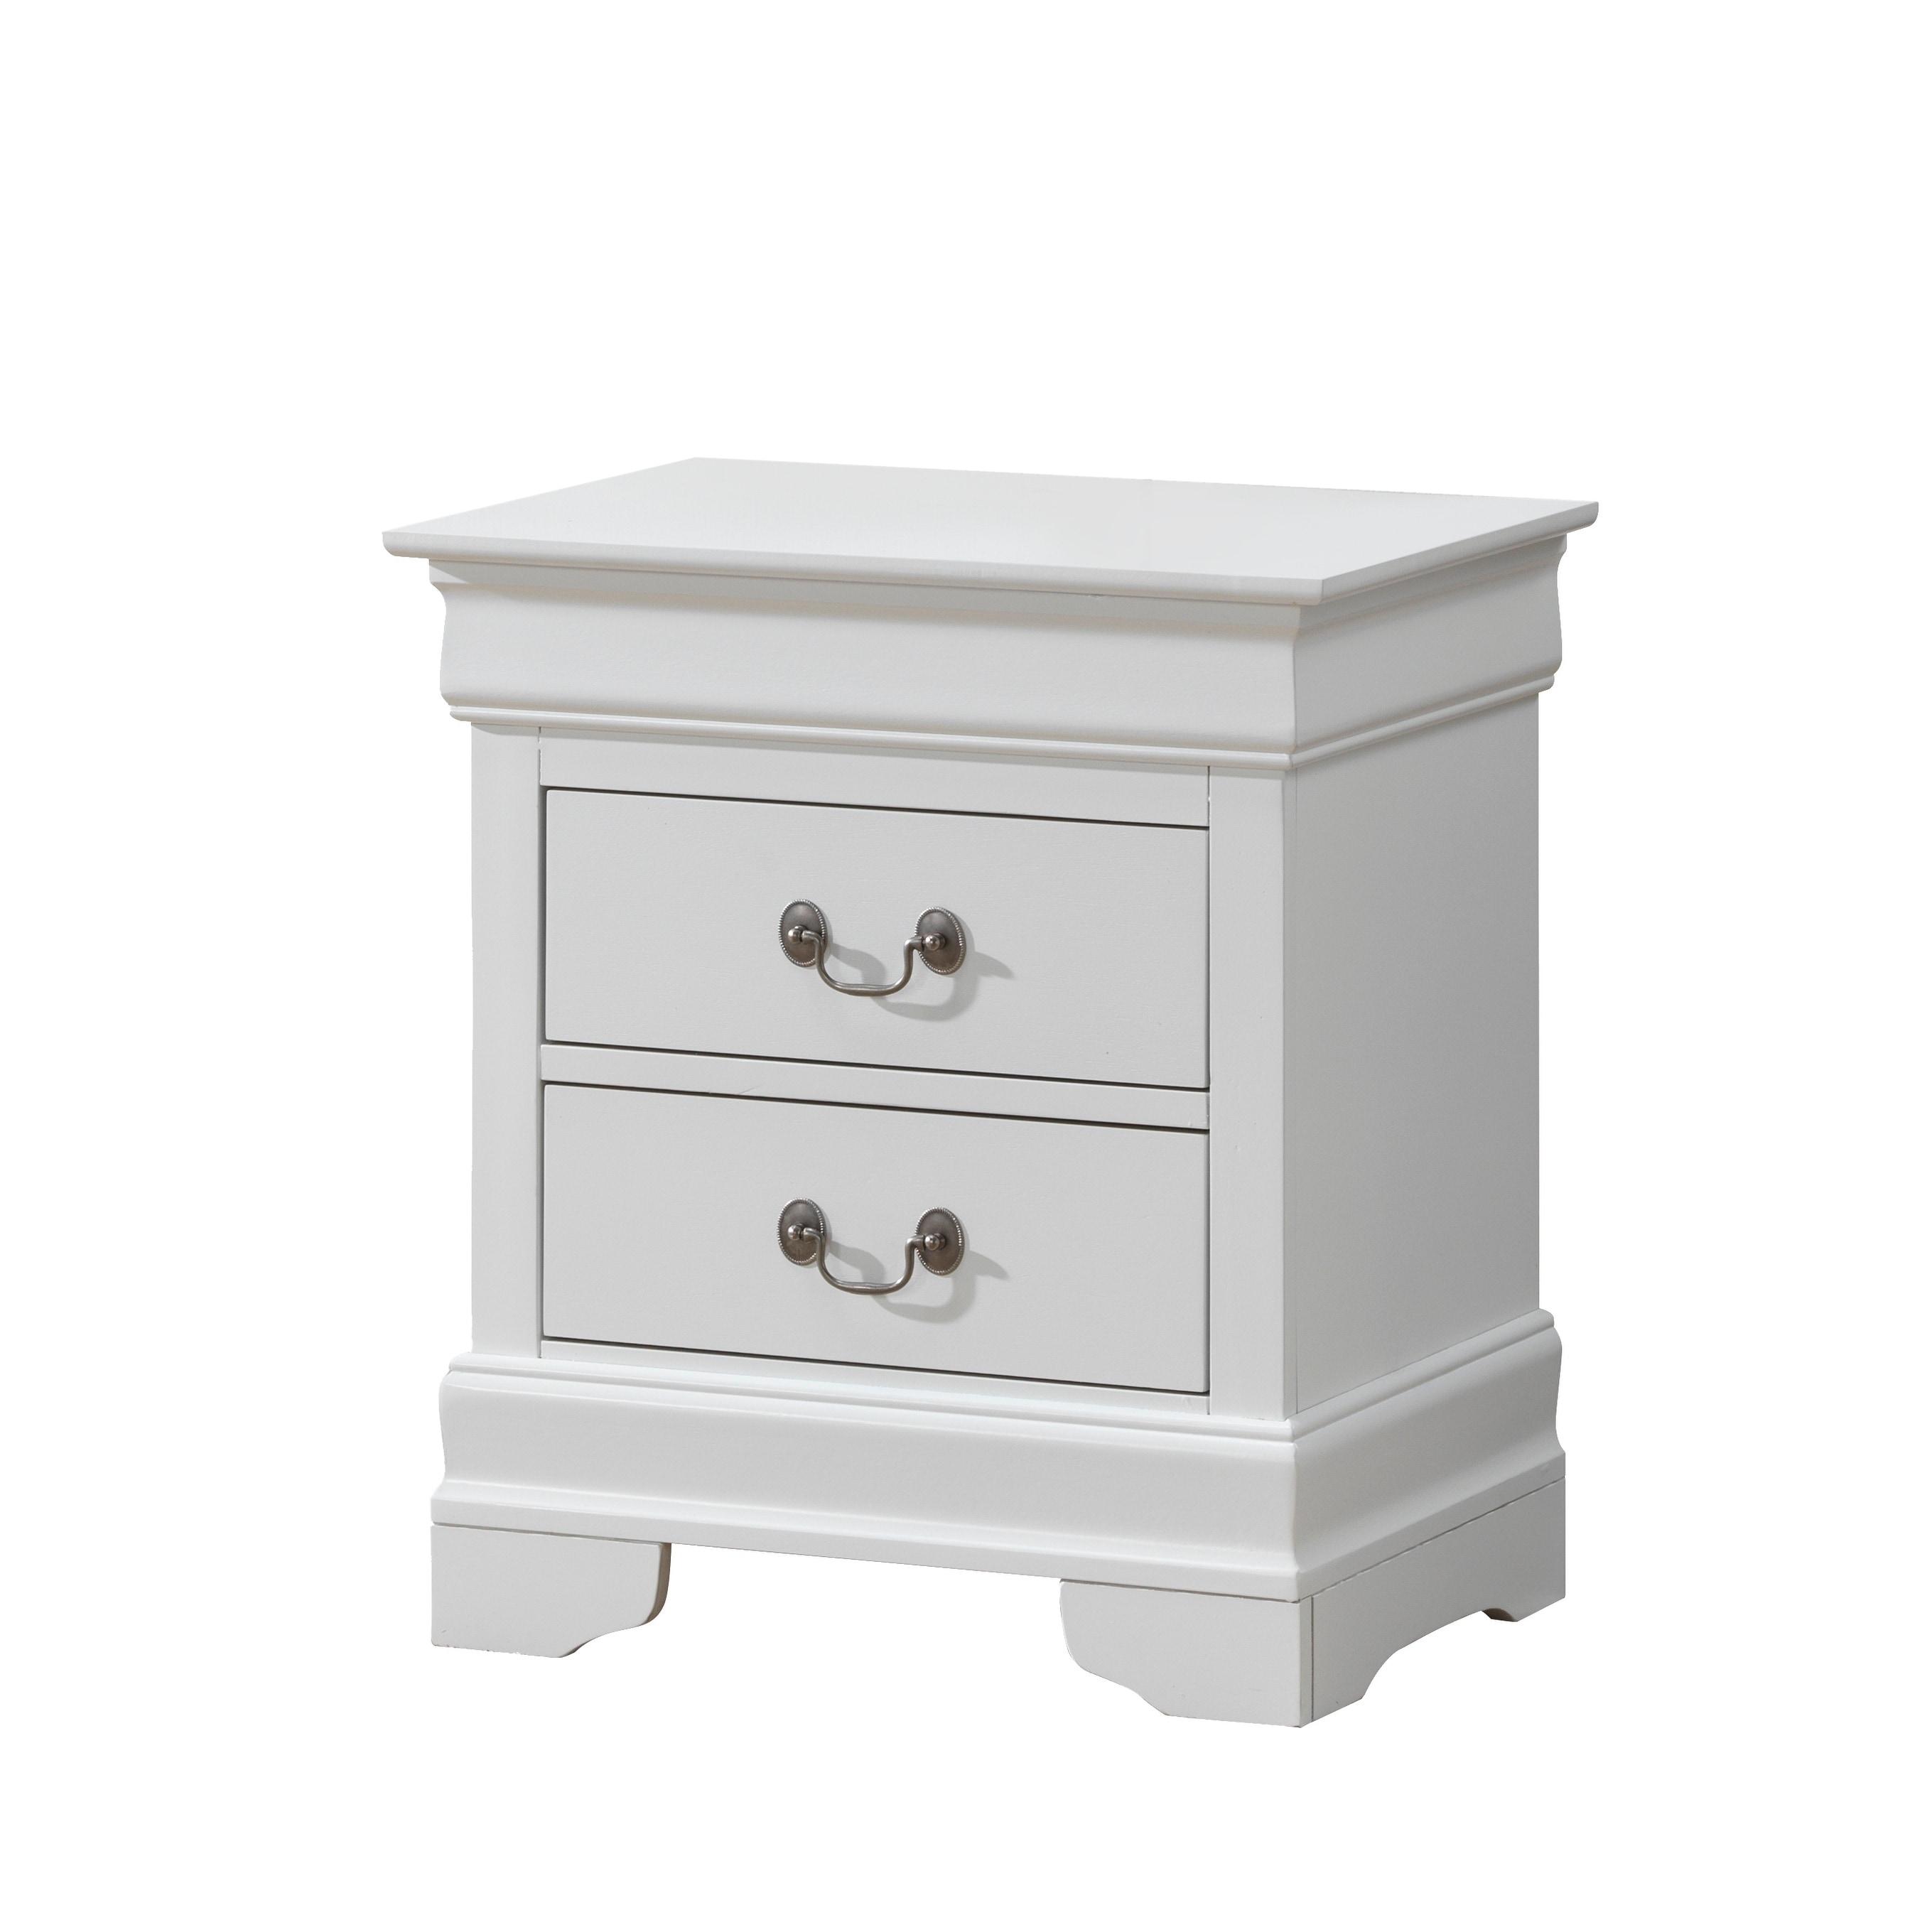 Glory Furniture 2 Drawer Nightstand